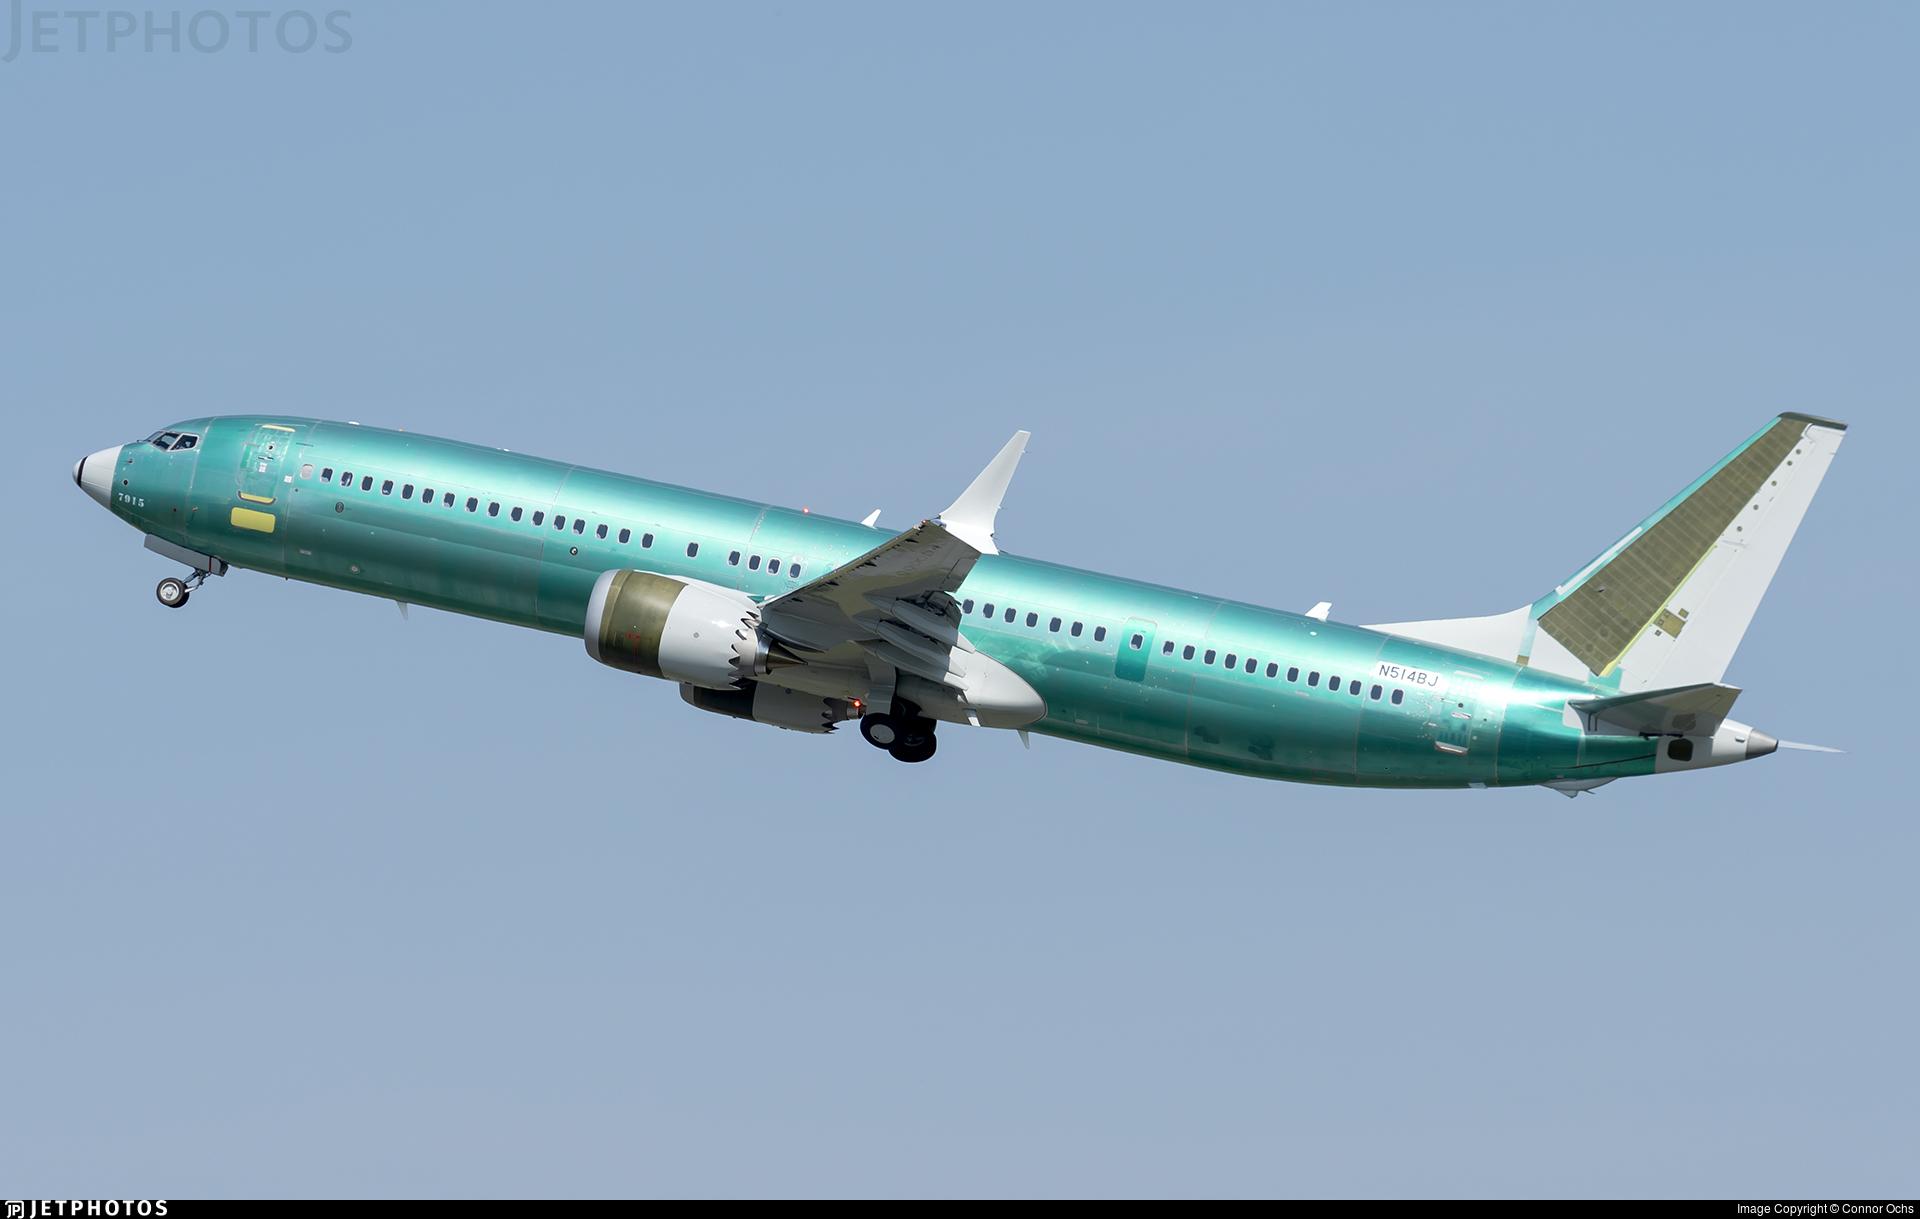 N514BJ - Boeing 737-9 MAX - Boeing Company